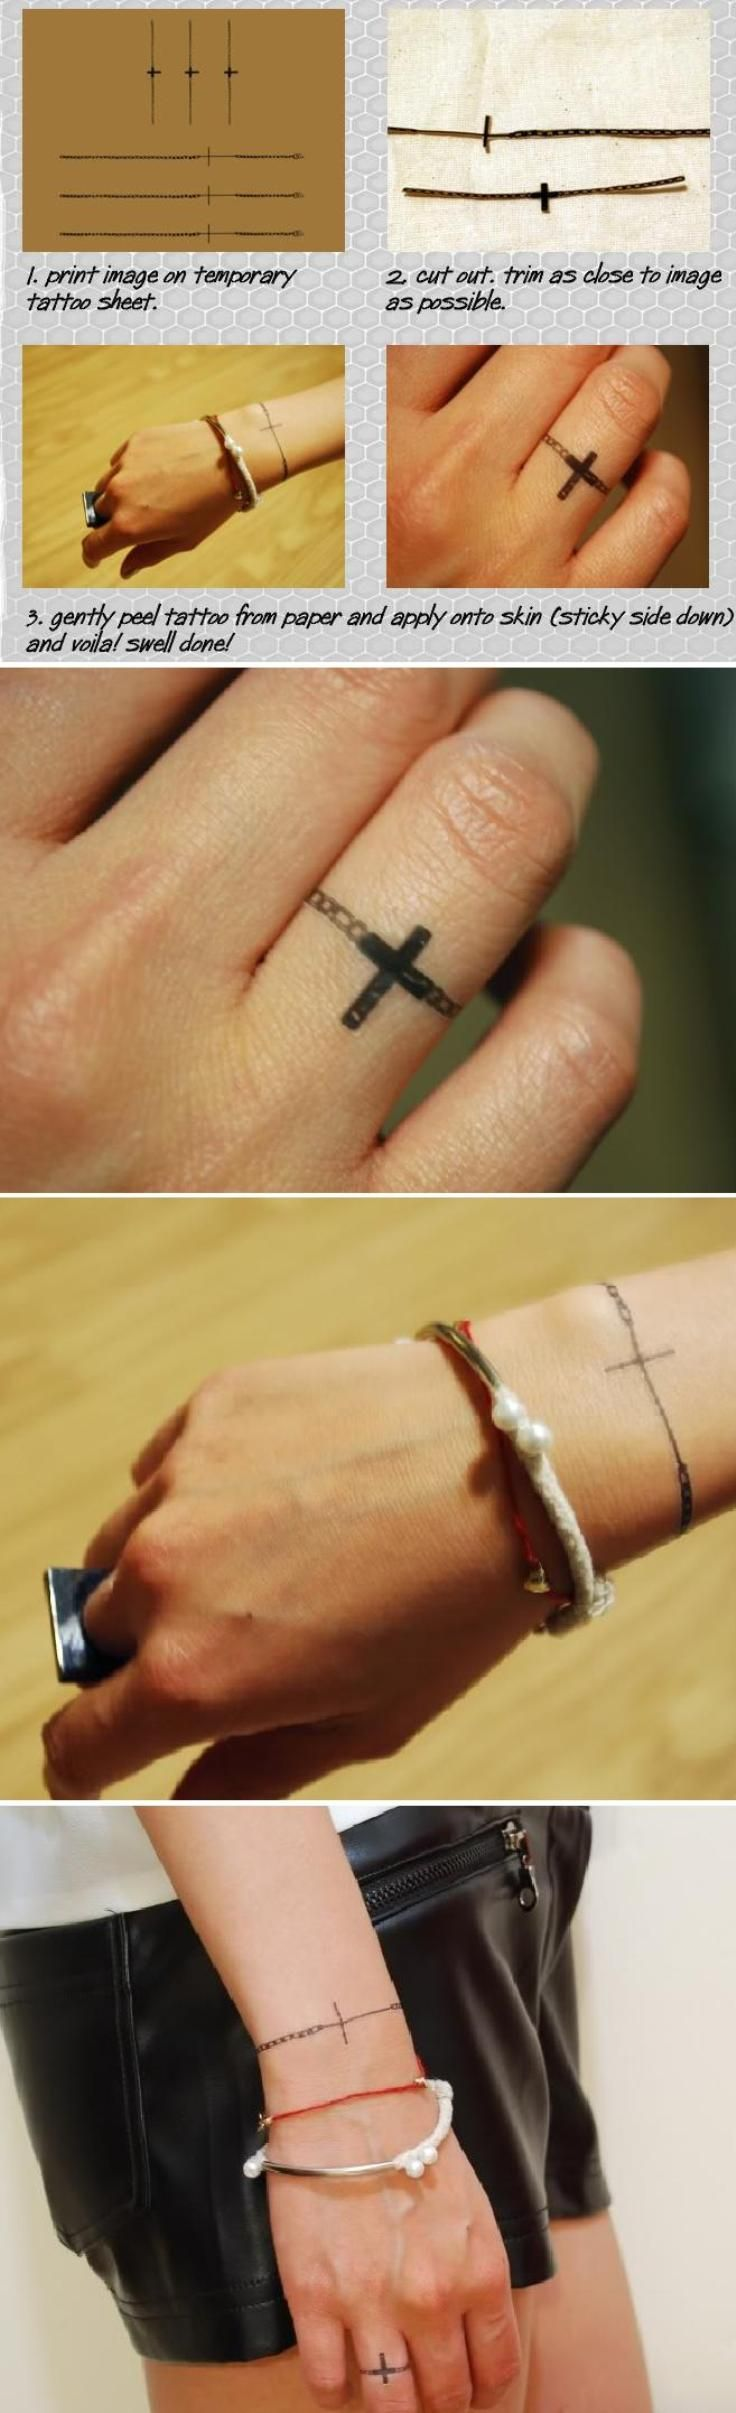 DIY Temporary Jewelry Tattoo buttt I like the idea of a cross ring tattoo